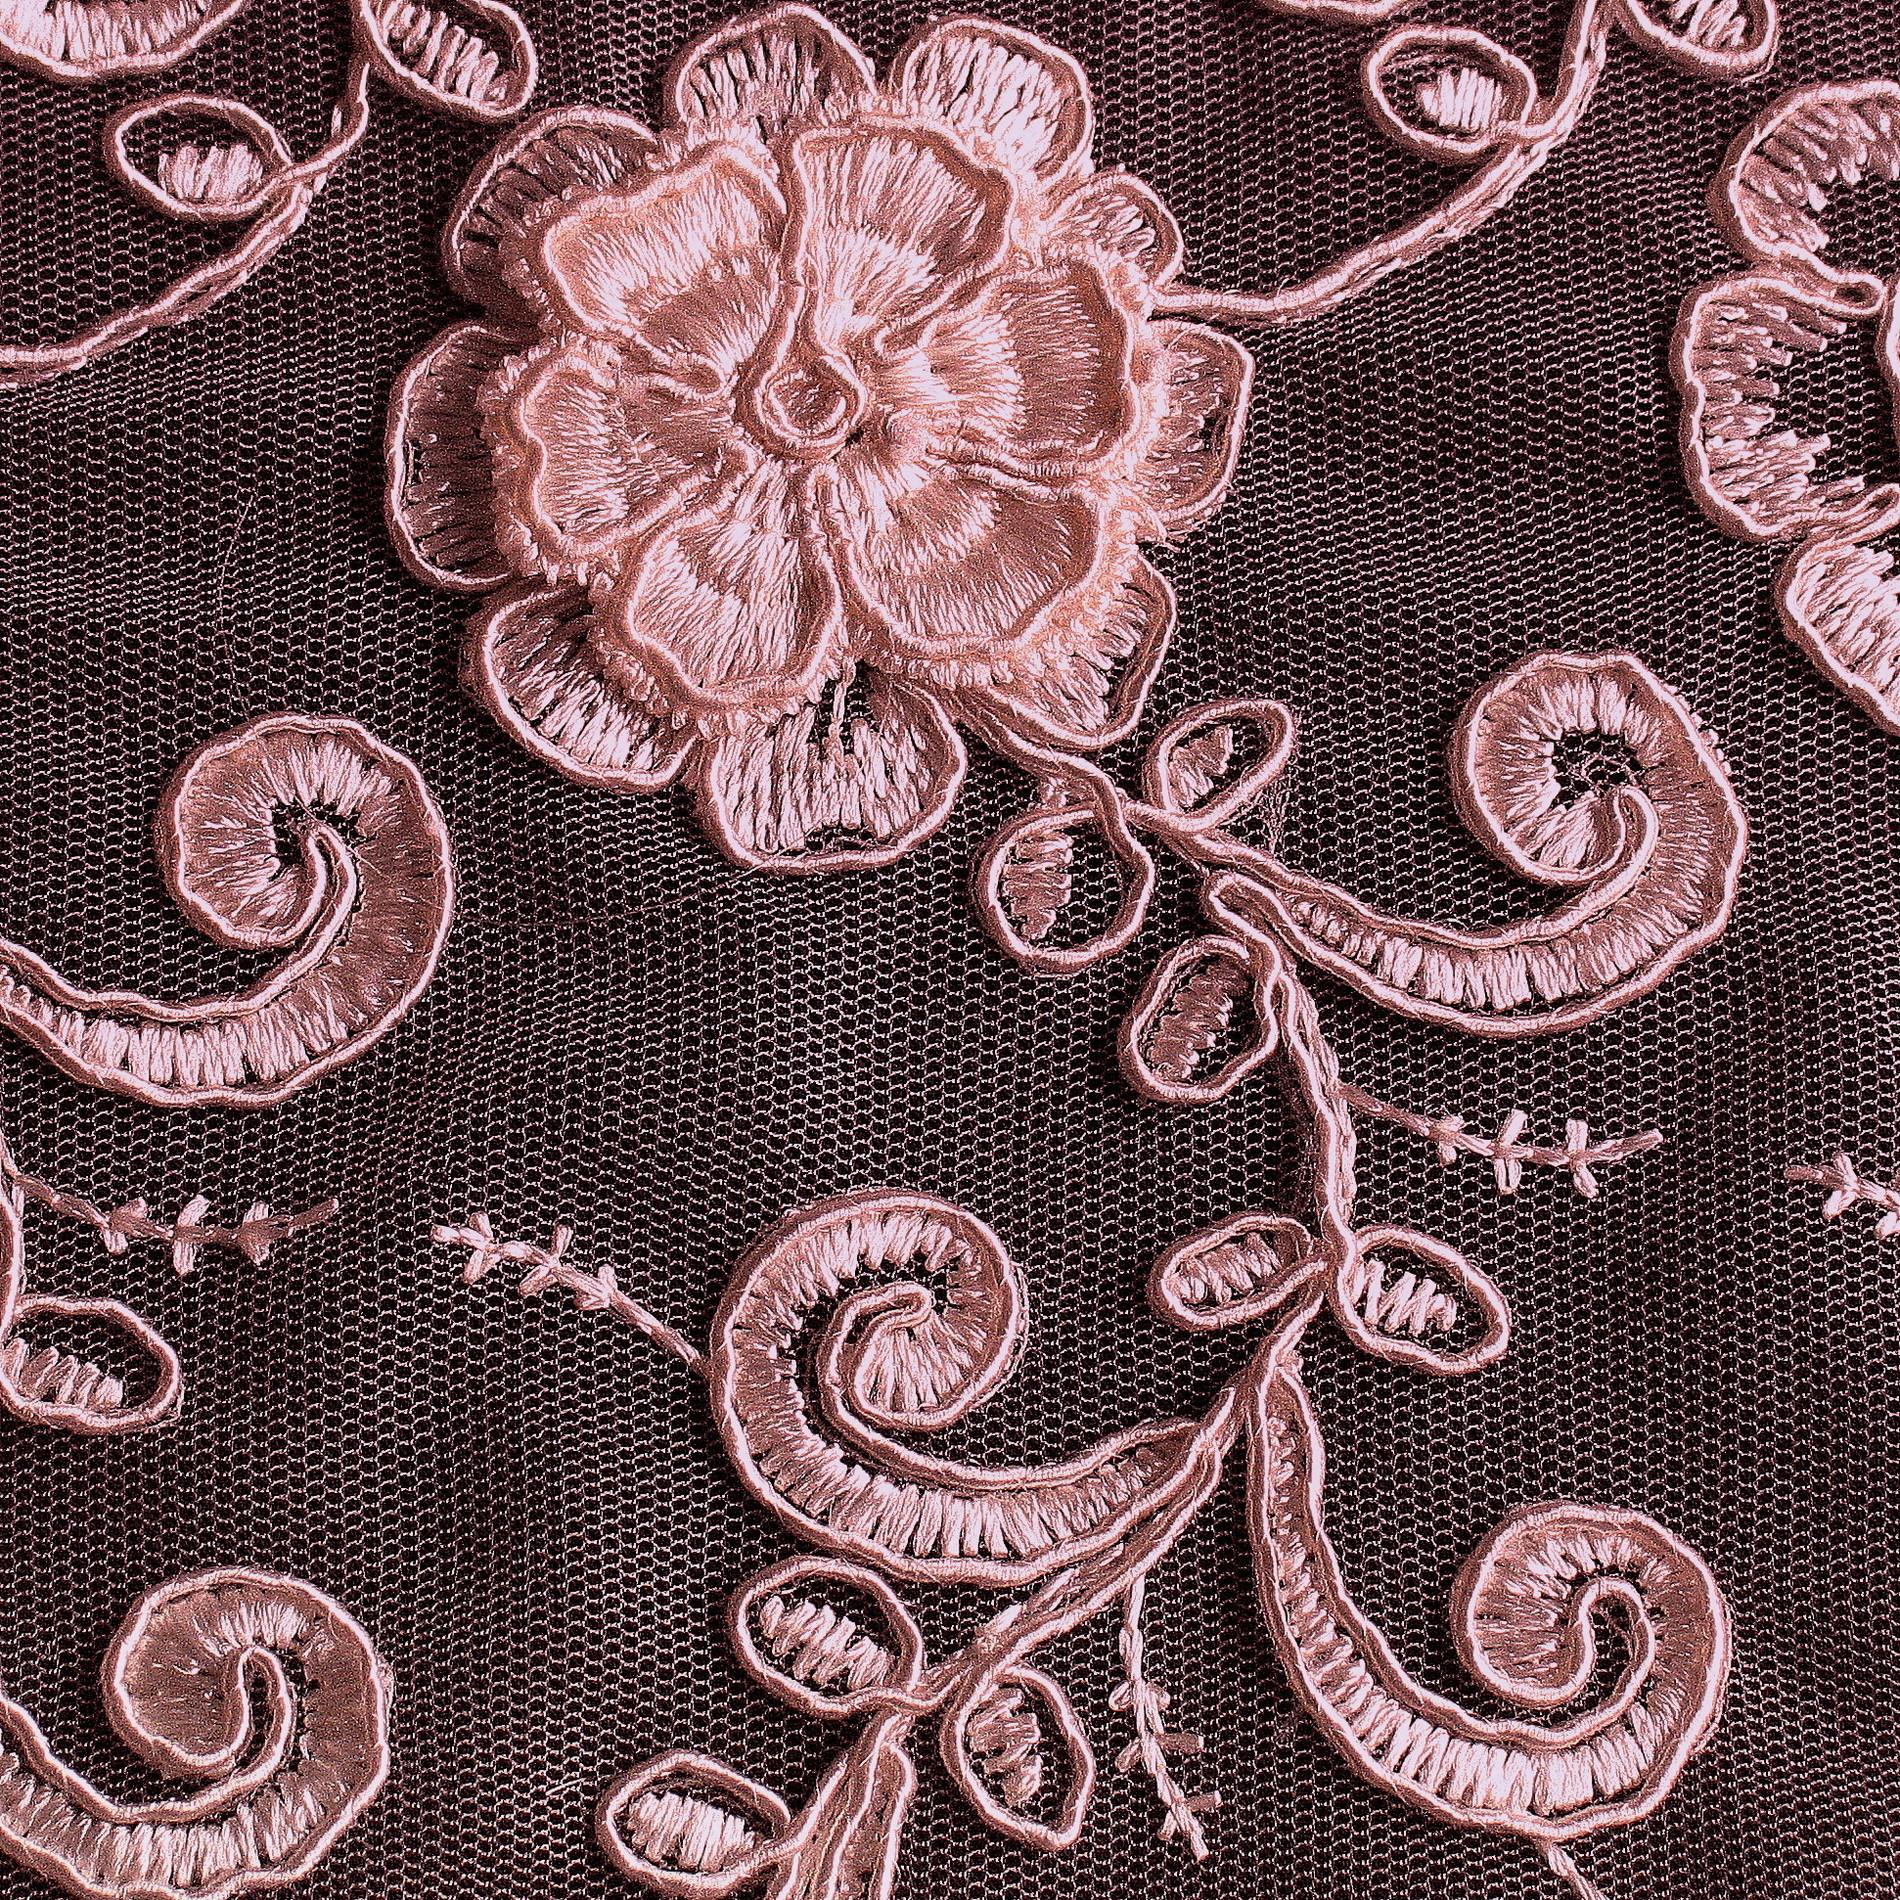 3d couture stoff spitze in ros bestickte spitzen pailletten bestickte spitze. Black Bedroom Furniture Sets. Home Design Ideas